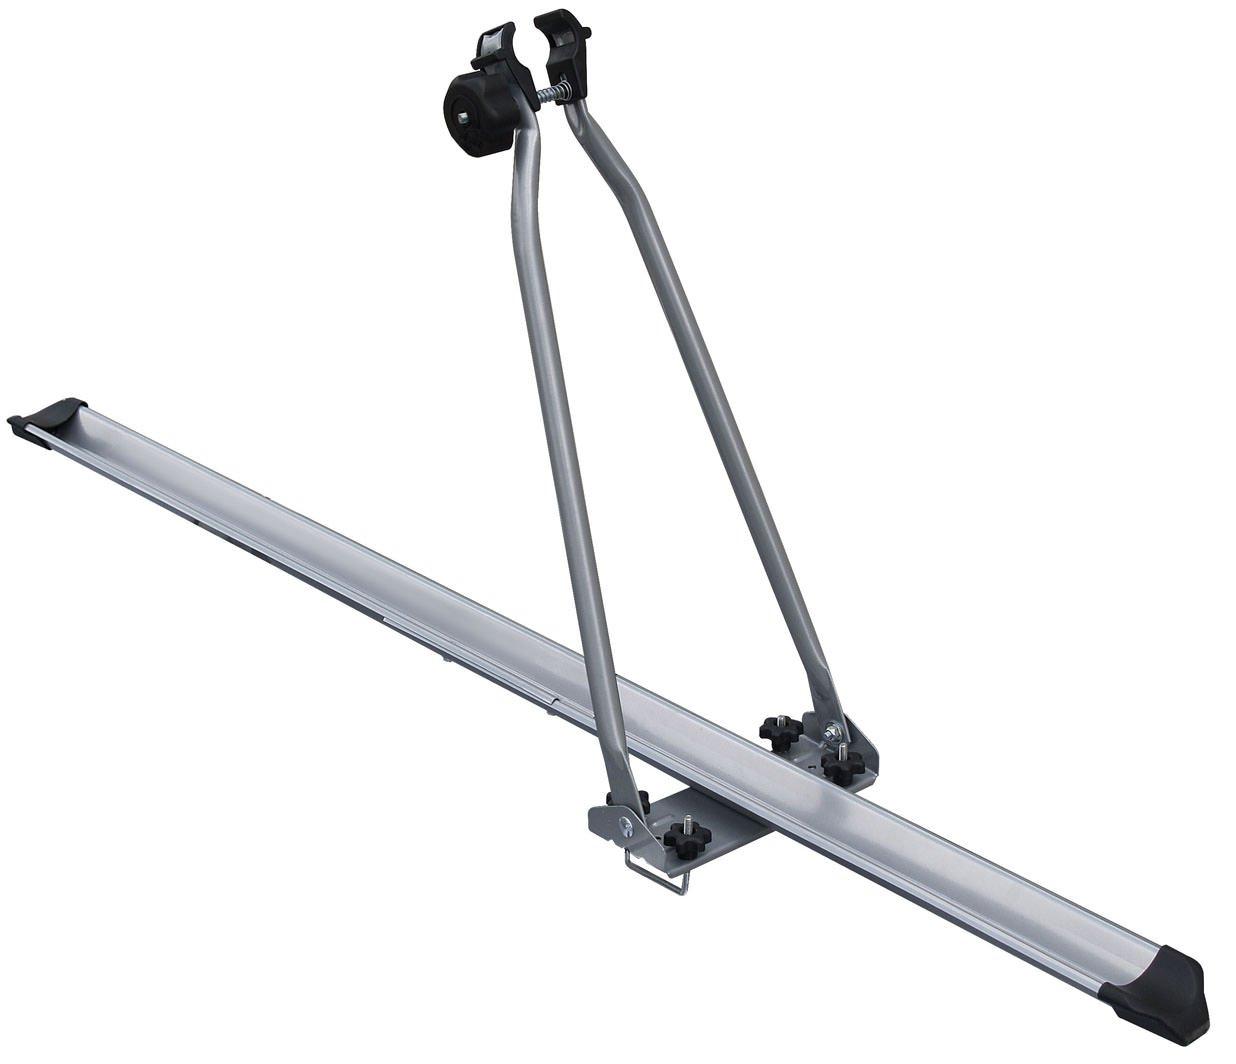 M-WAY 0000240MW000 Foxbat Roof Mounted Bike Carrier